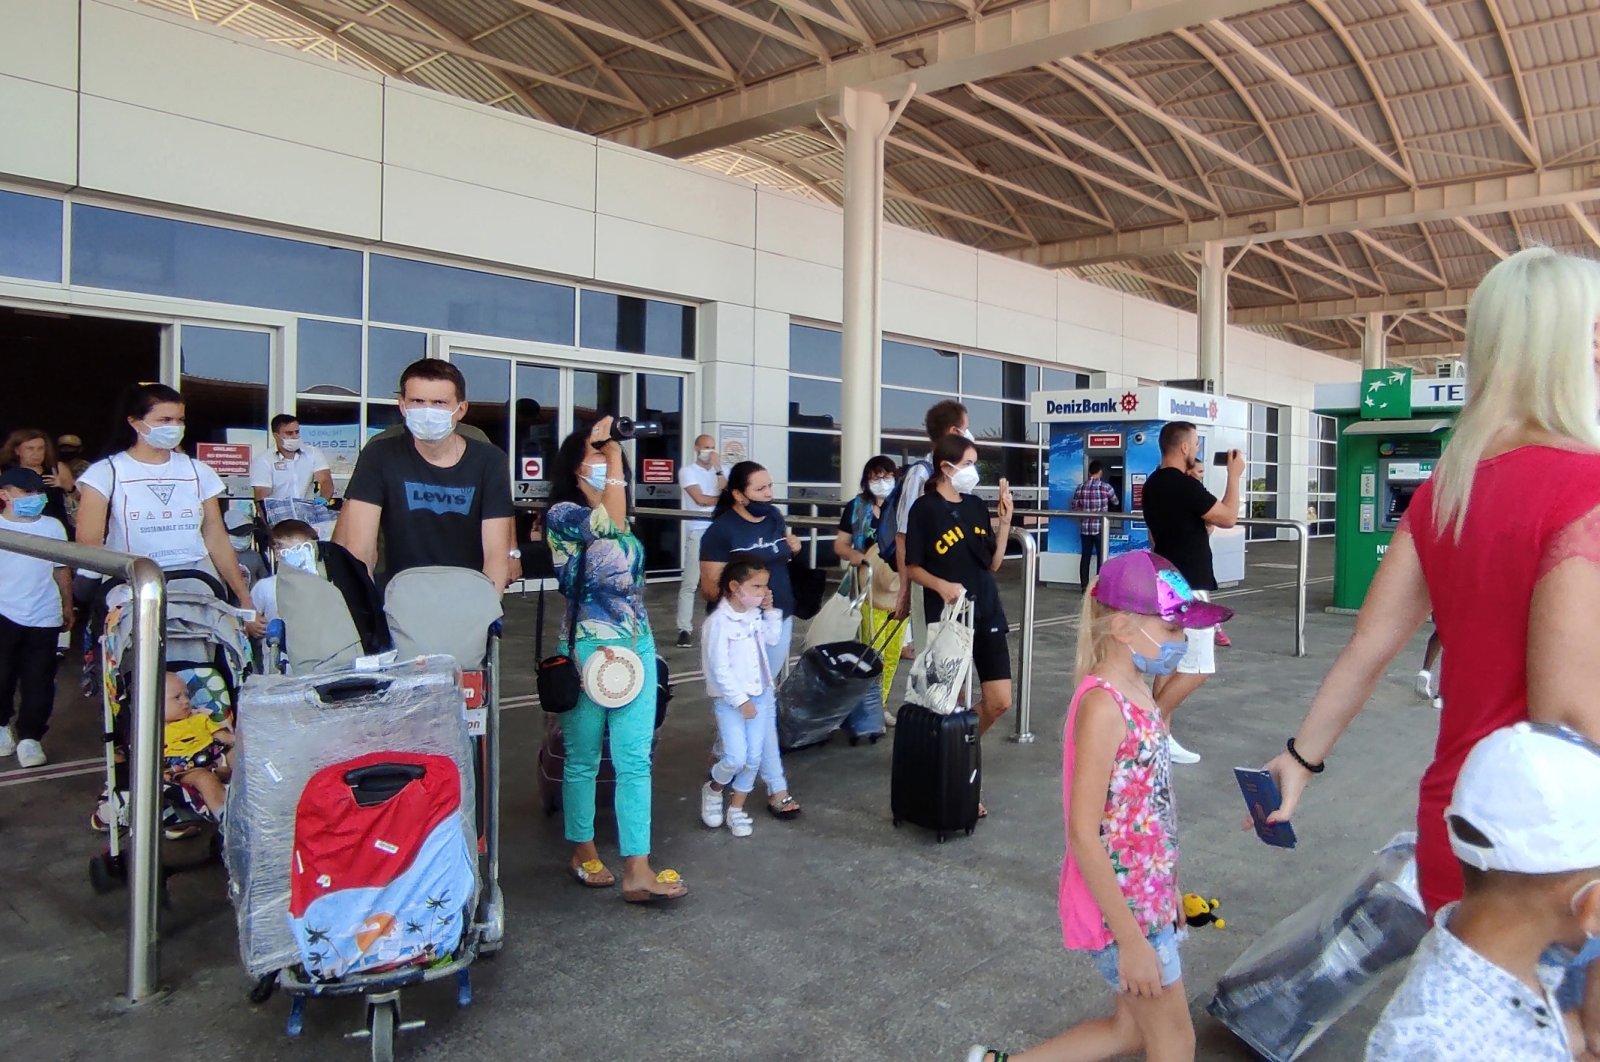 Tourists arrive at Antalya Airport, Antalya, Turkey, Nov. 17, 2020. (DHA Photo)